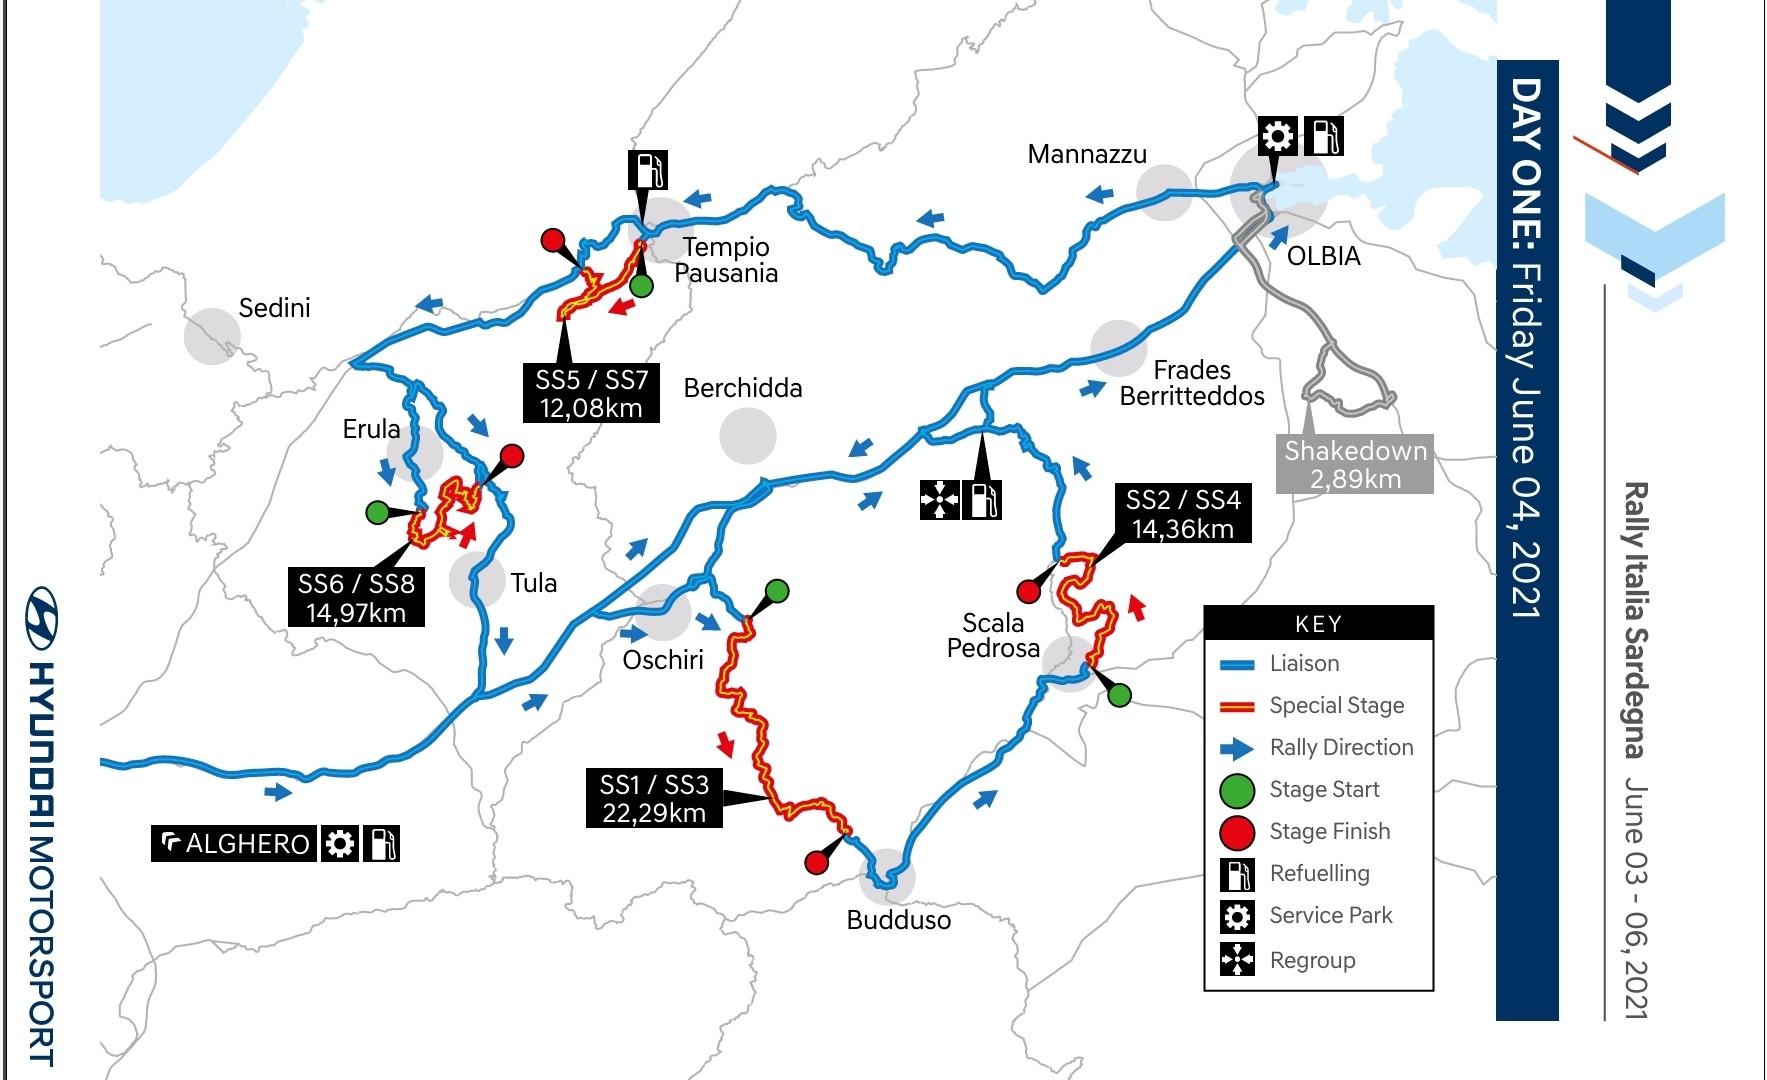 WRC: Rally d'Italia - Sardegna [3-6 Junio] - Página 2 E3A9uqyXwAQ2zby?format=jpg&name=large